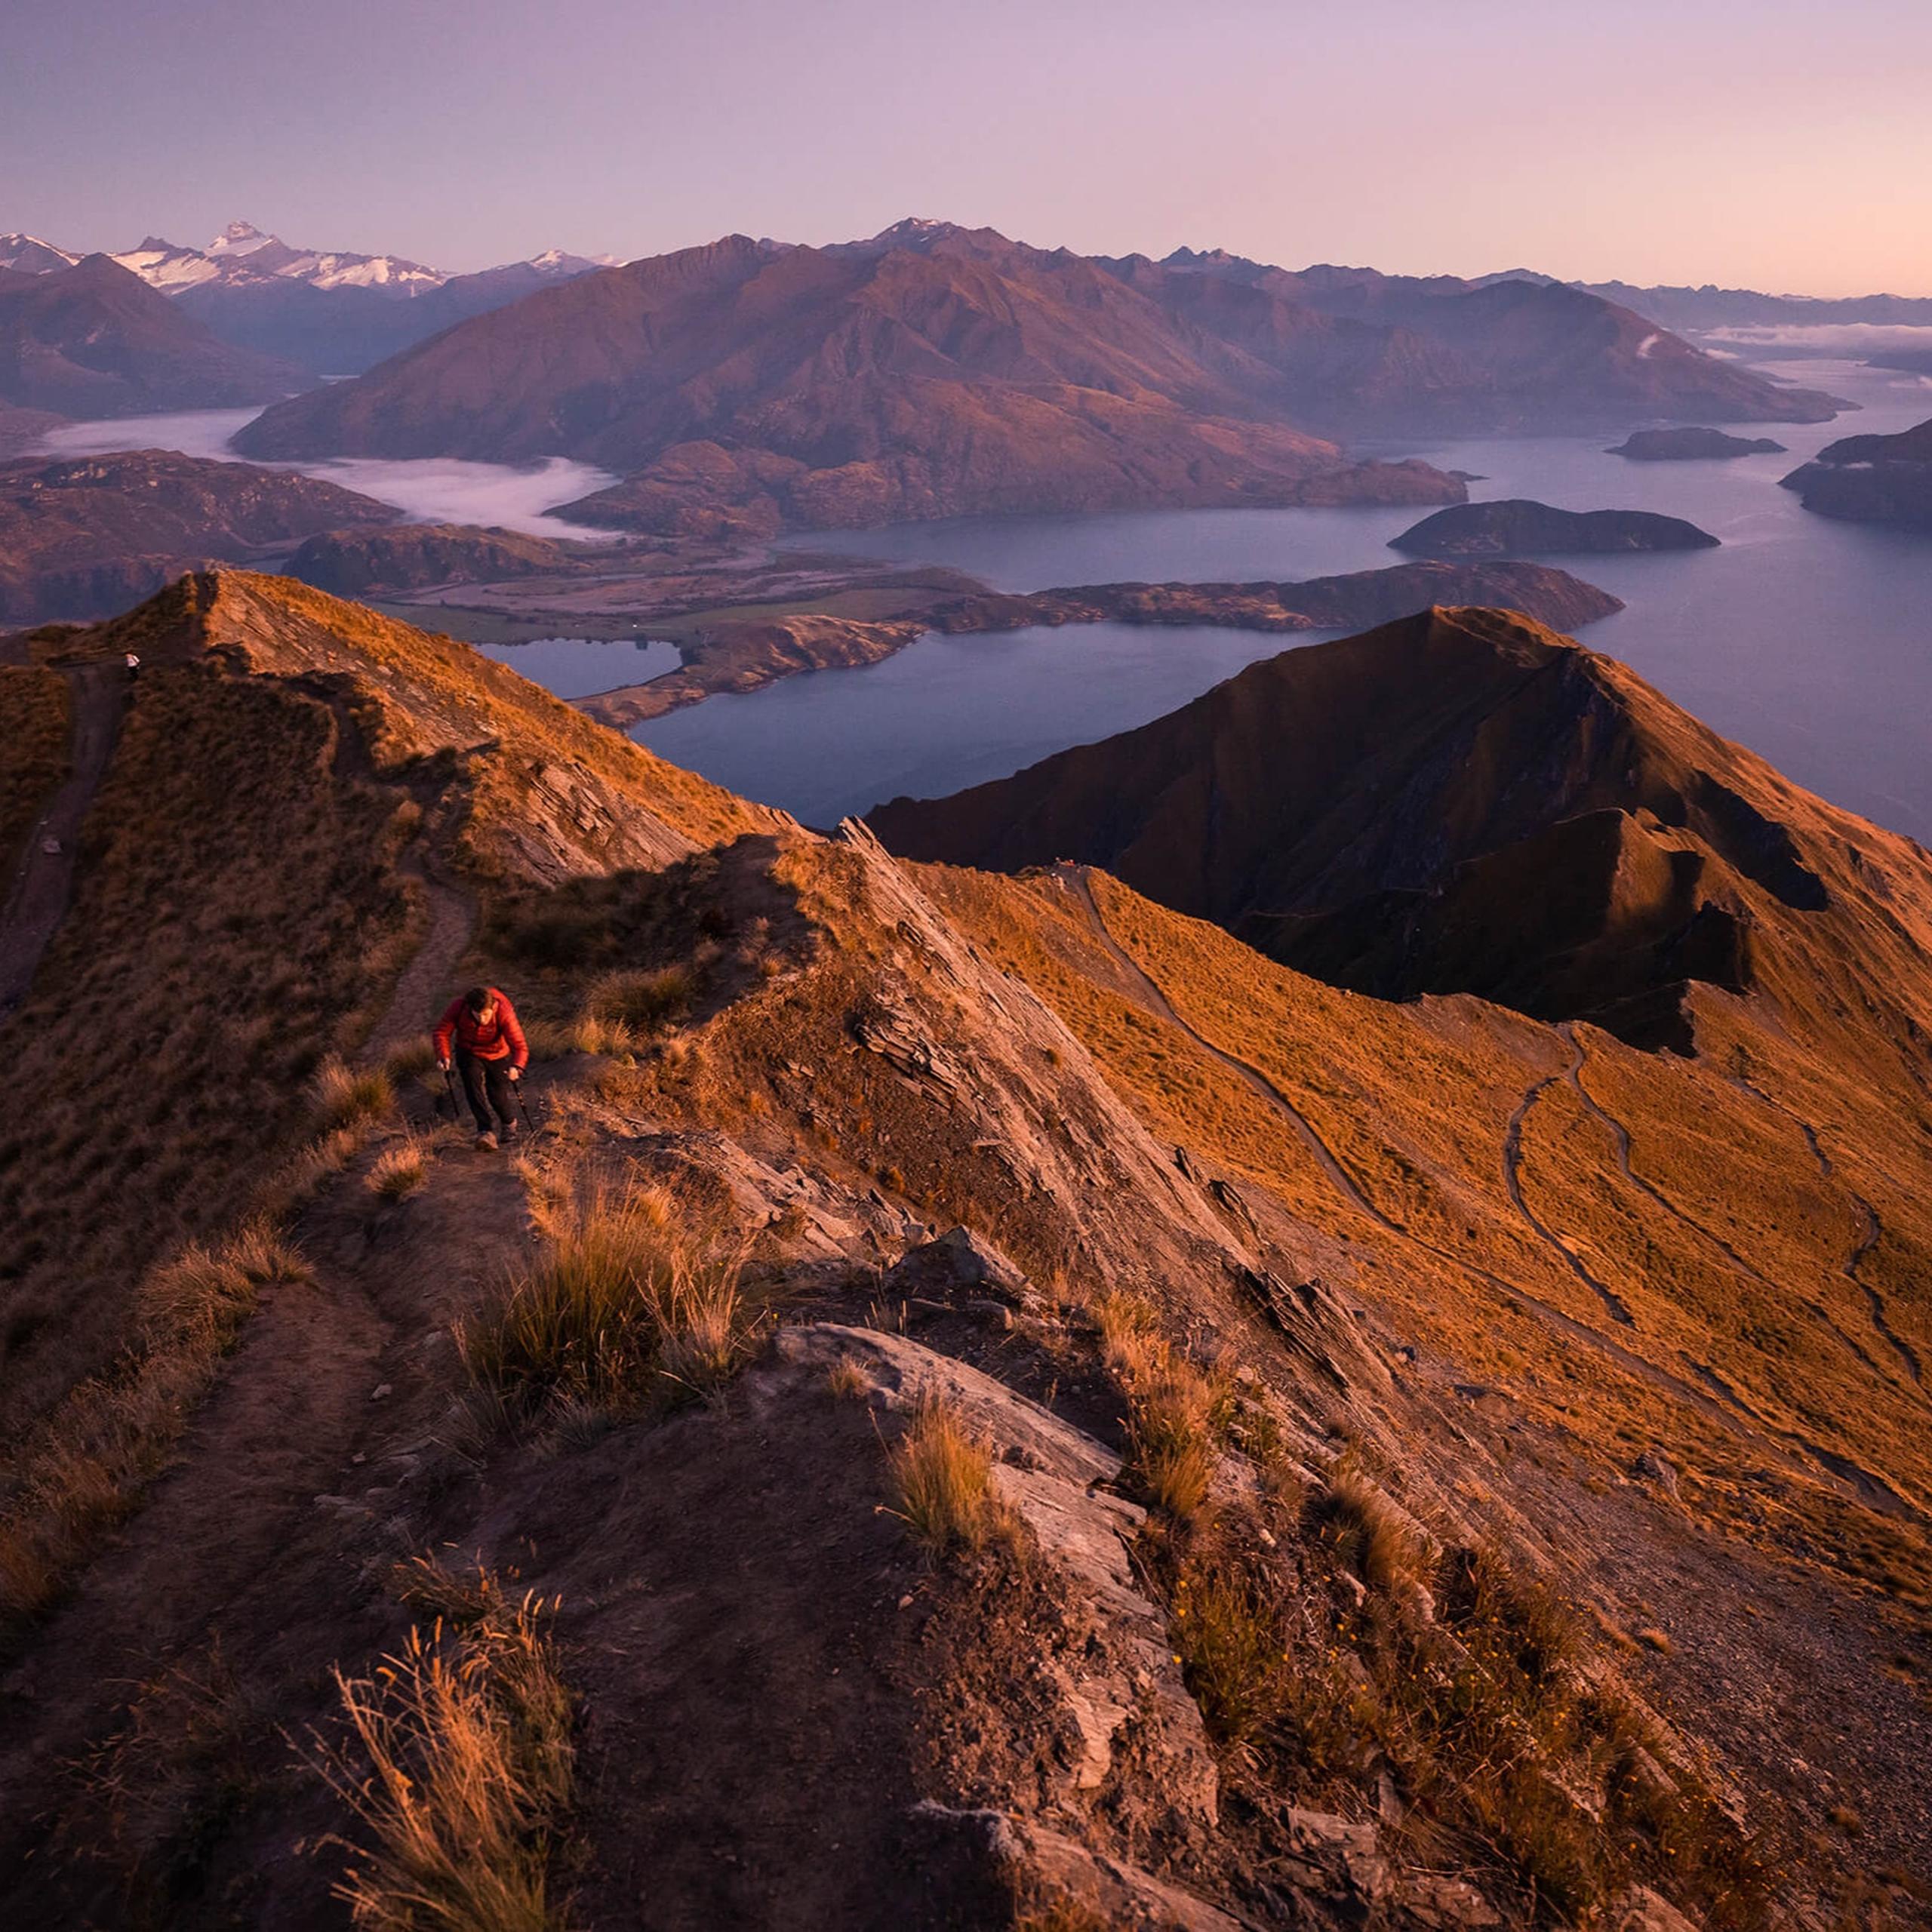 Adam Weist | Adventuring Through the Subtropical Rainforests and Active Volcanoes of New Zealand